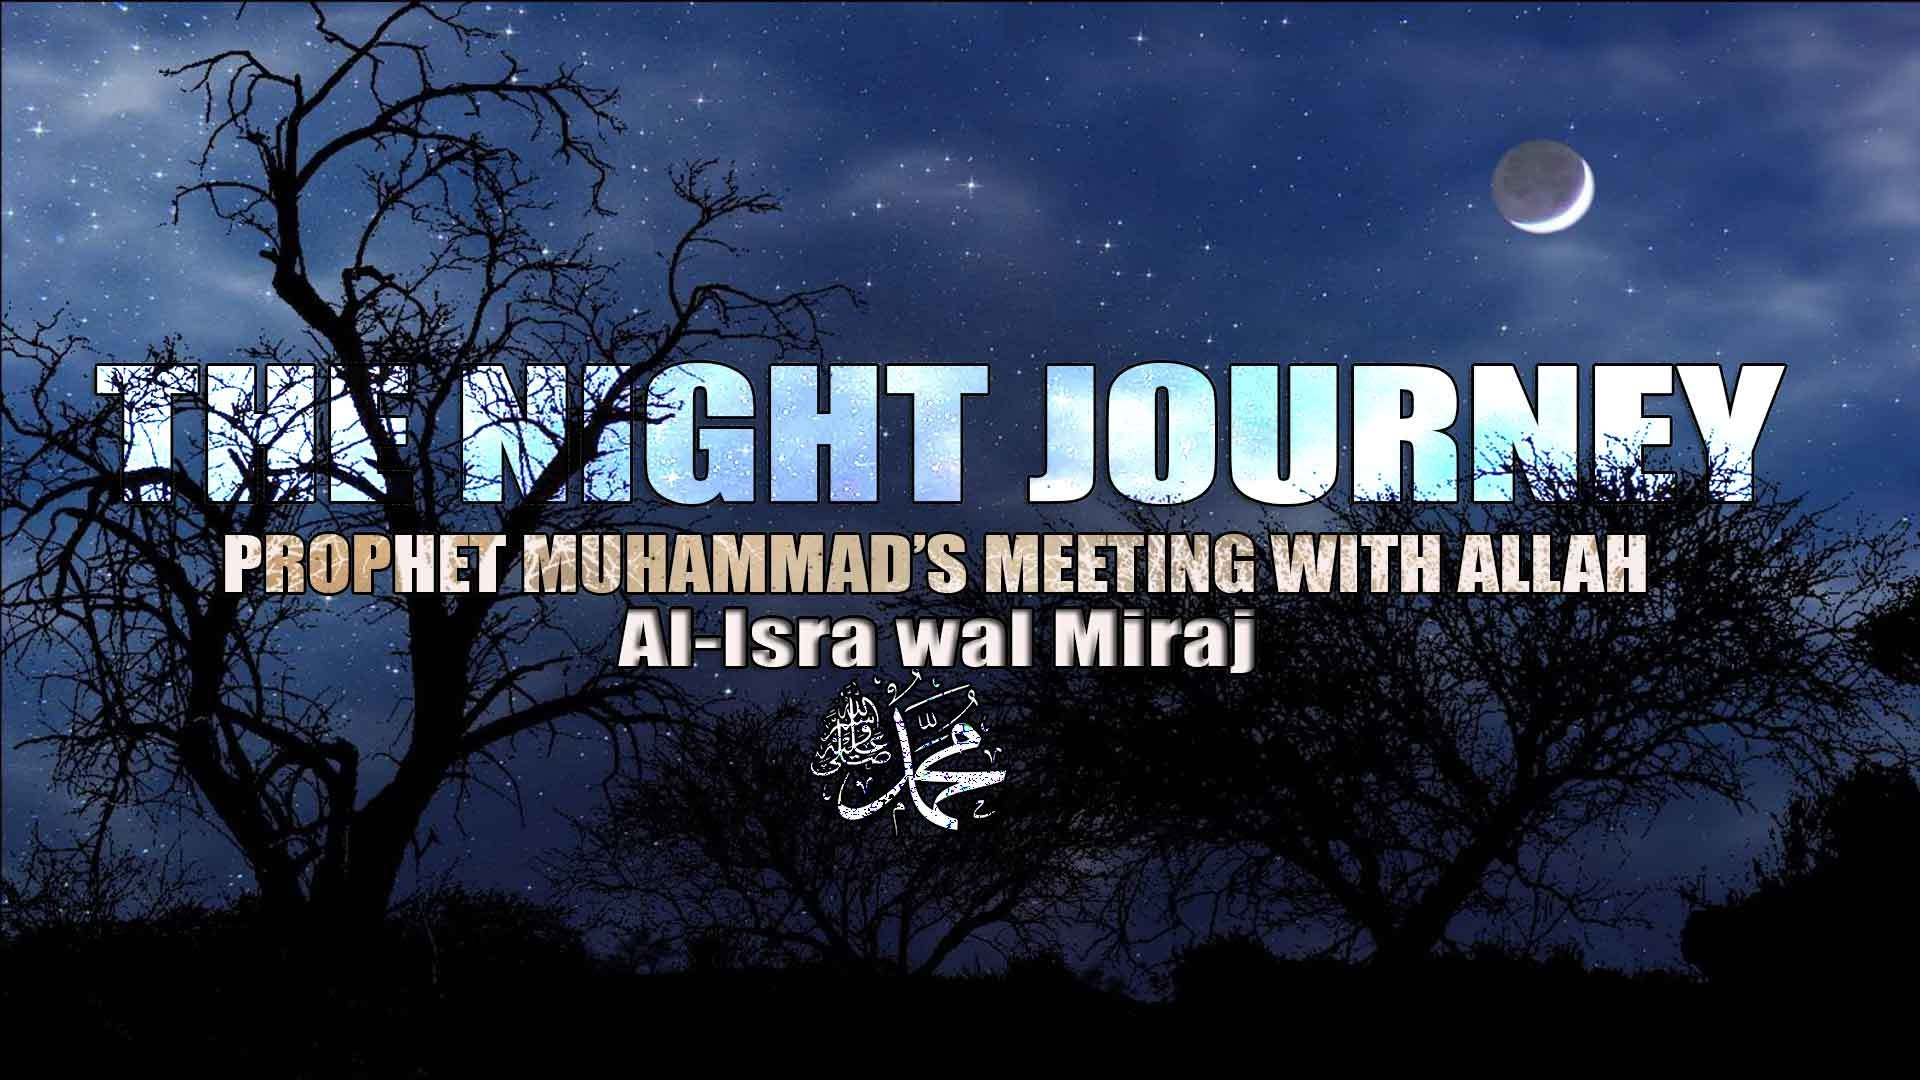 The Night Journey - IslamiCity 281790e6c2b